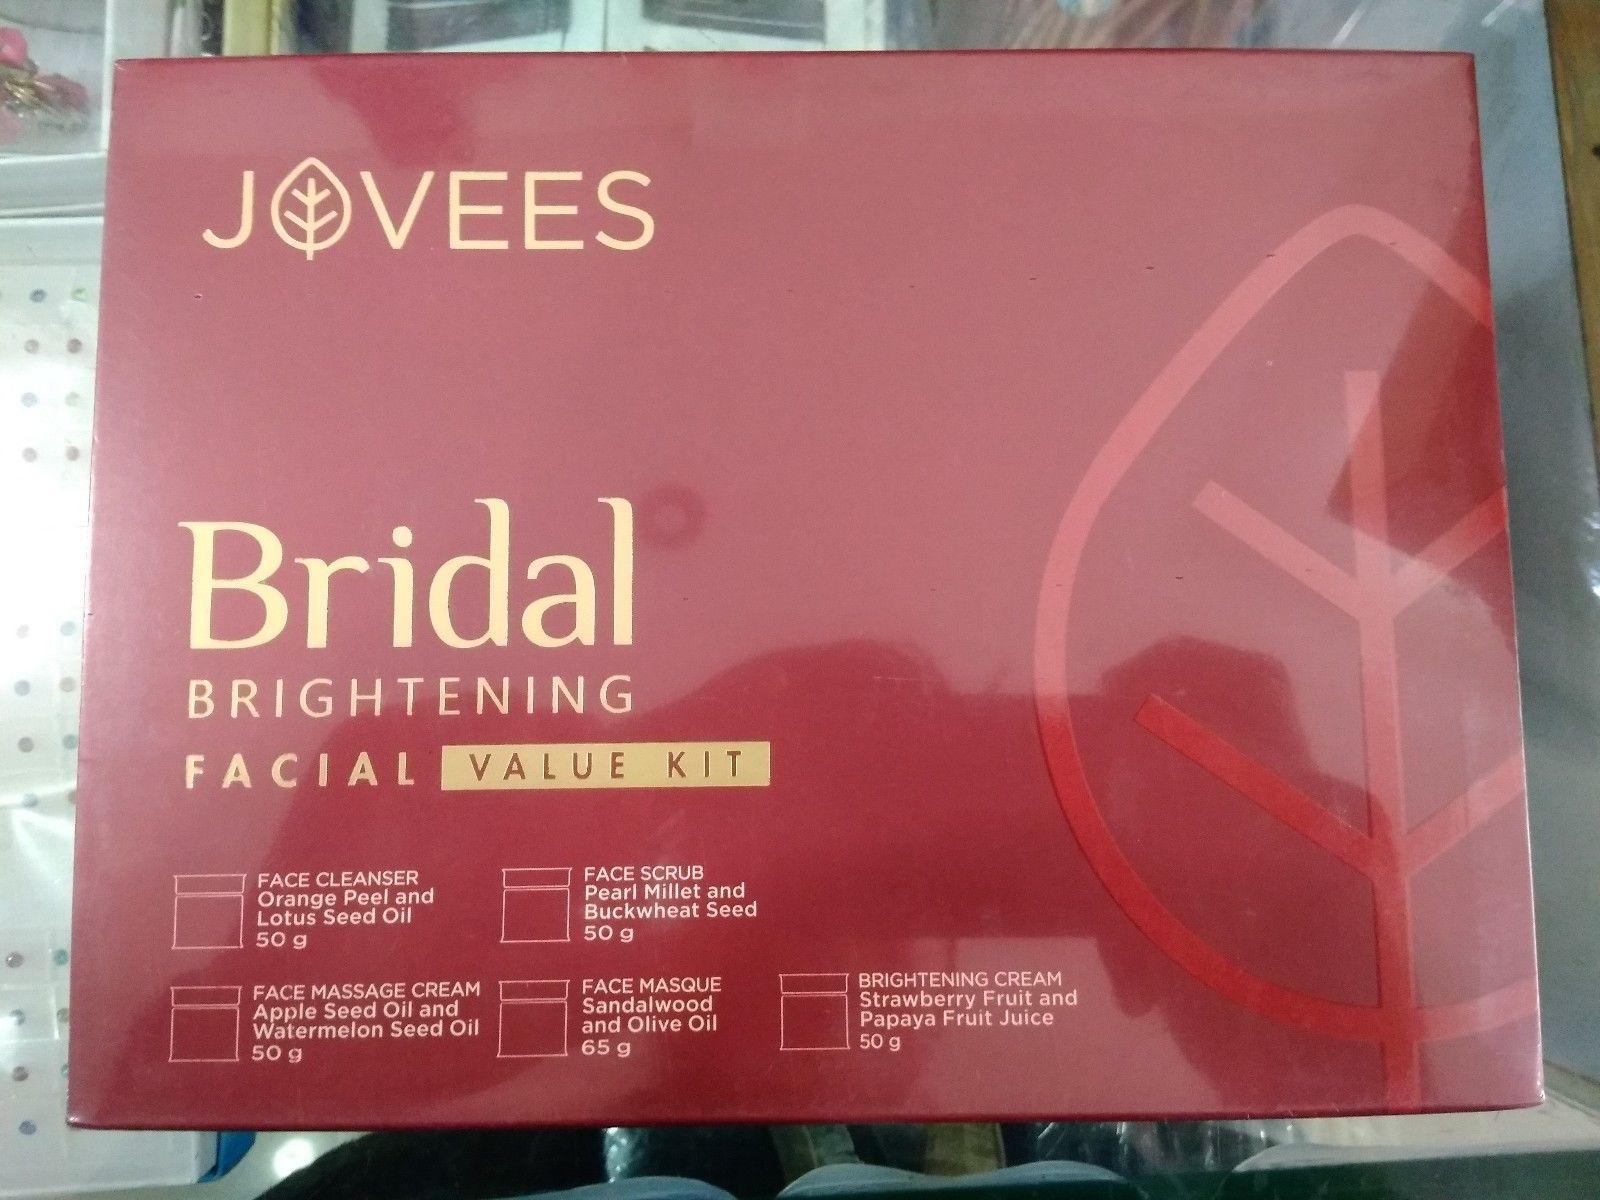 Jovees Bridal Brightening Facial Value Kit For Women - 265gm | Think ...